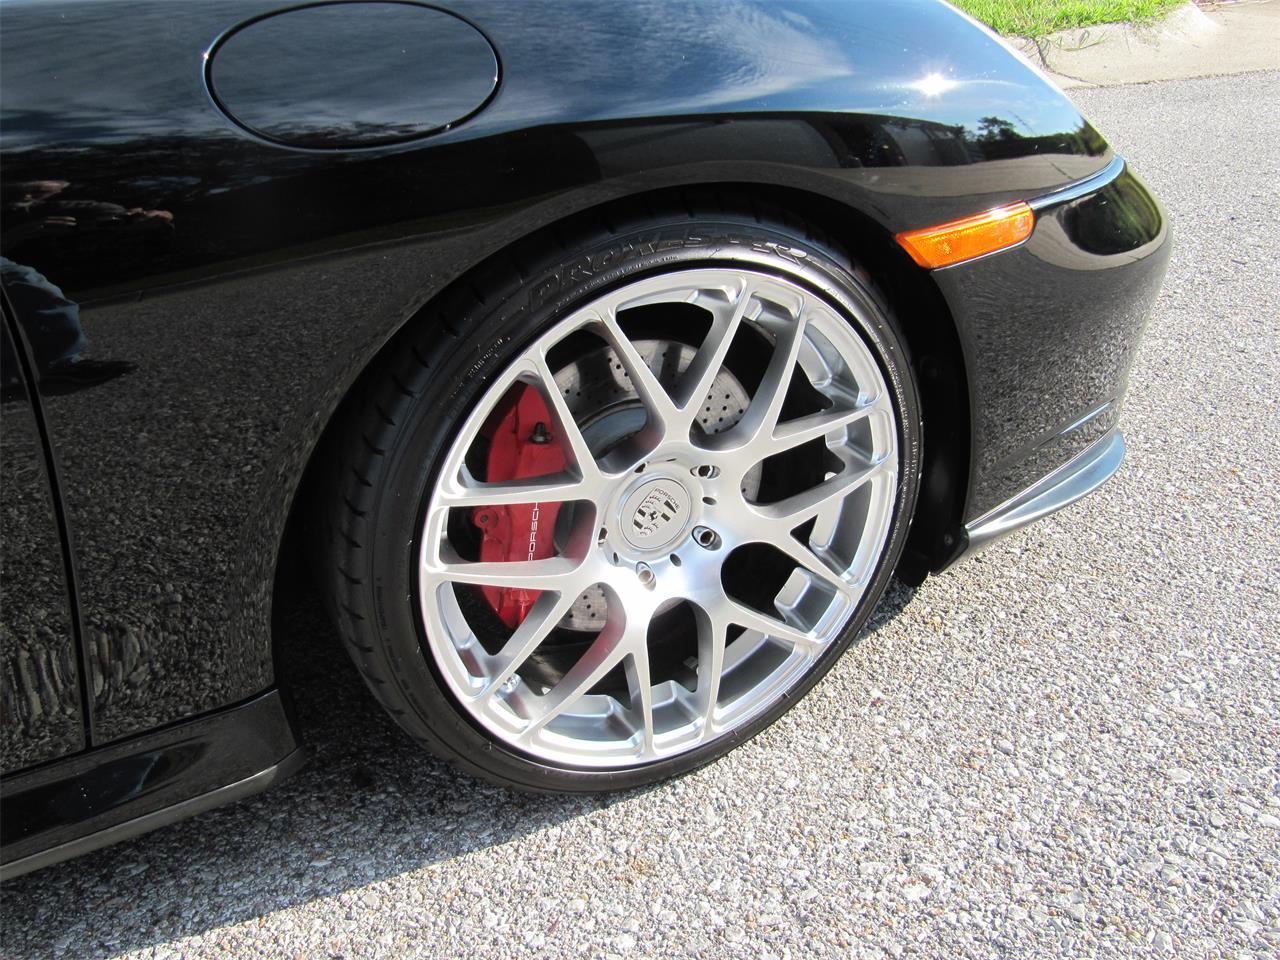 2001 Porsche 911 Carrera Turbo (CC-1368985) for sale in Omaha, Nebraska